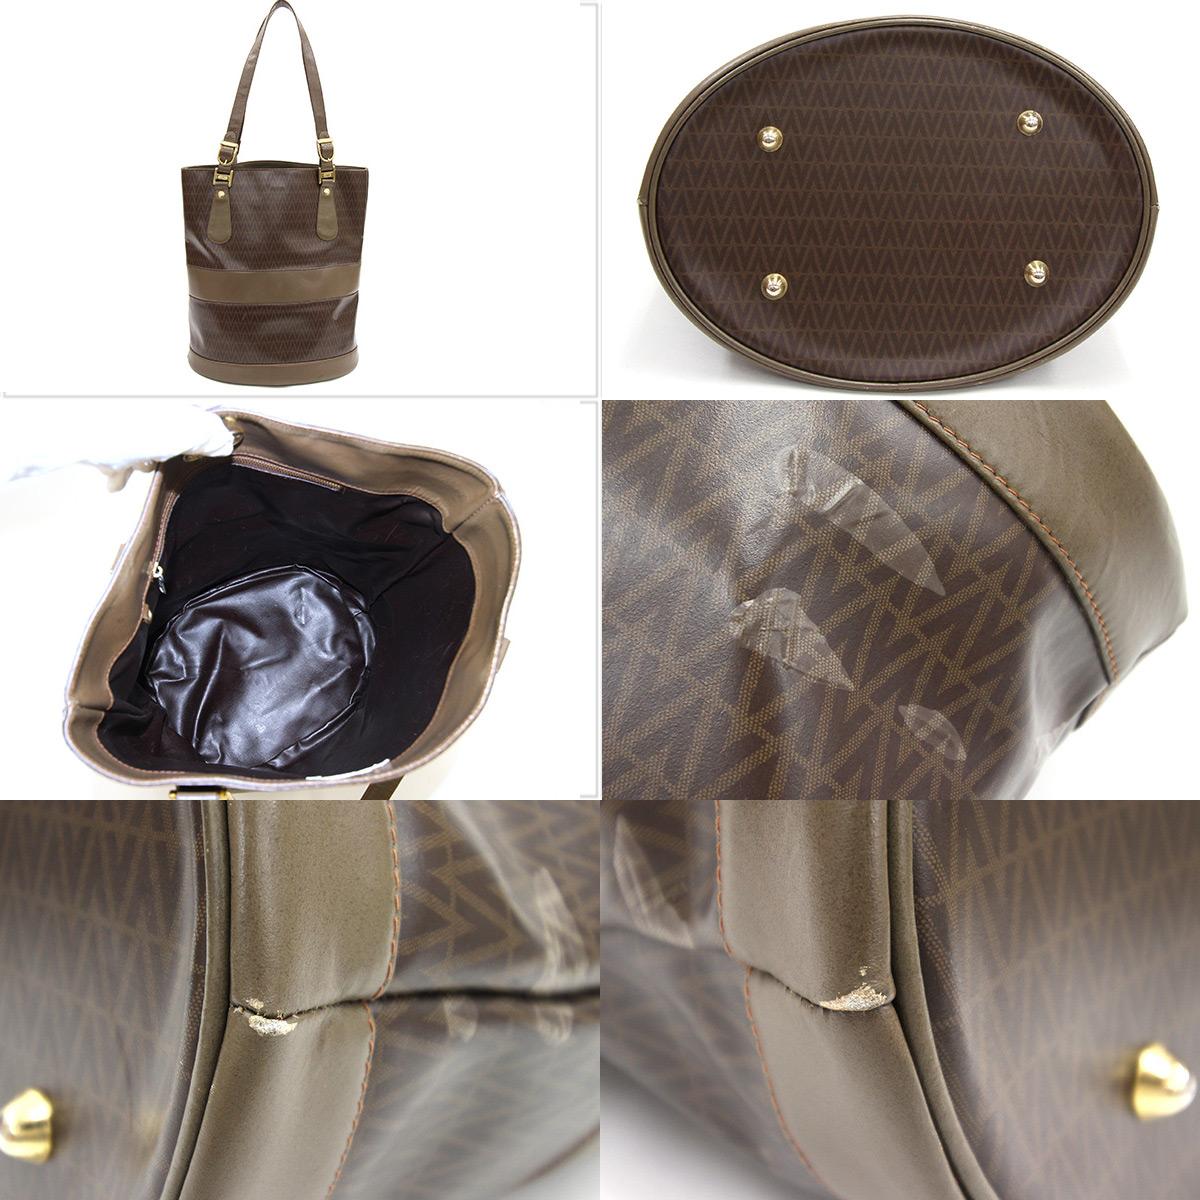 Old tea system handbag shawl Lady's Valentino bucket type vintage old rare  classic retro antique MARIO VALENTINO in the Mario Valentino tote bag beige